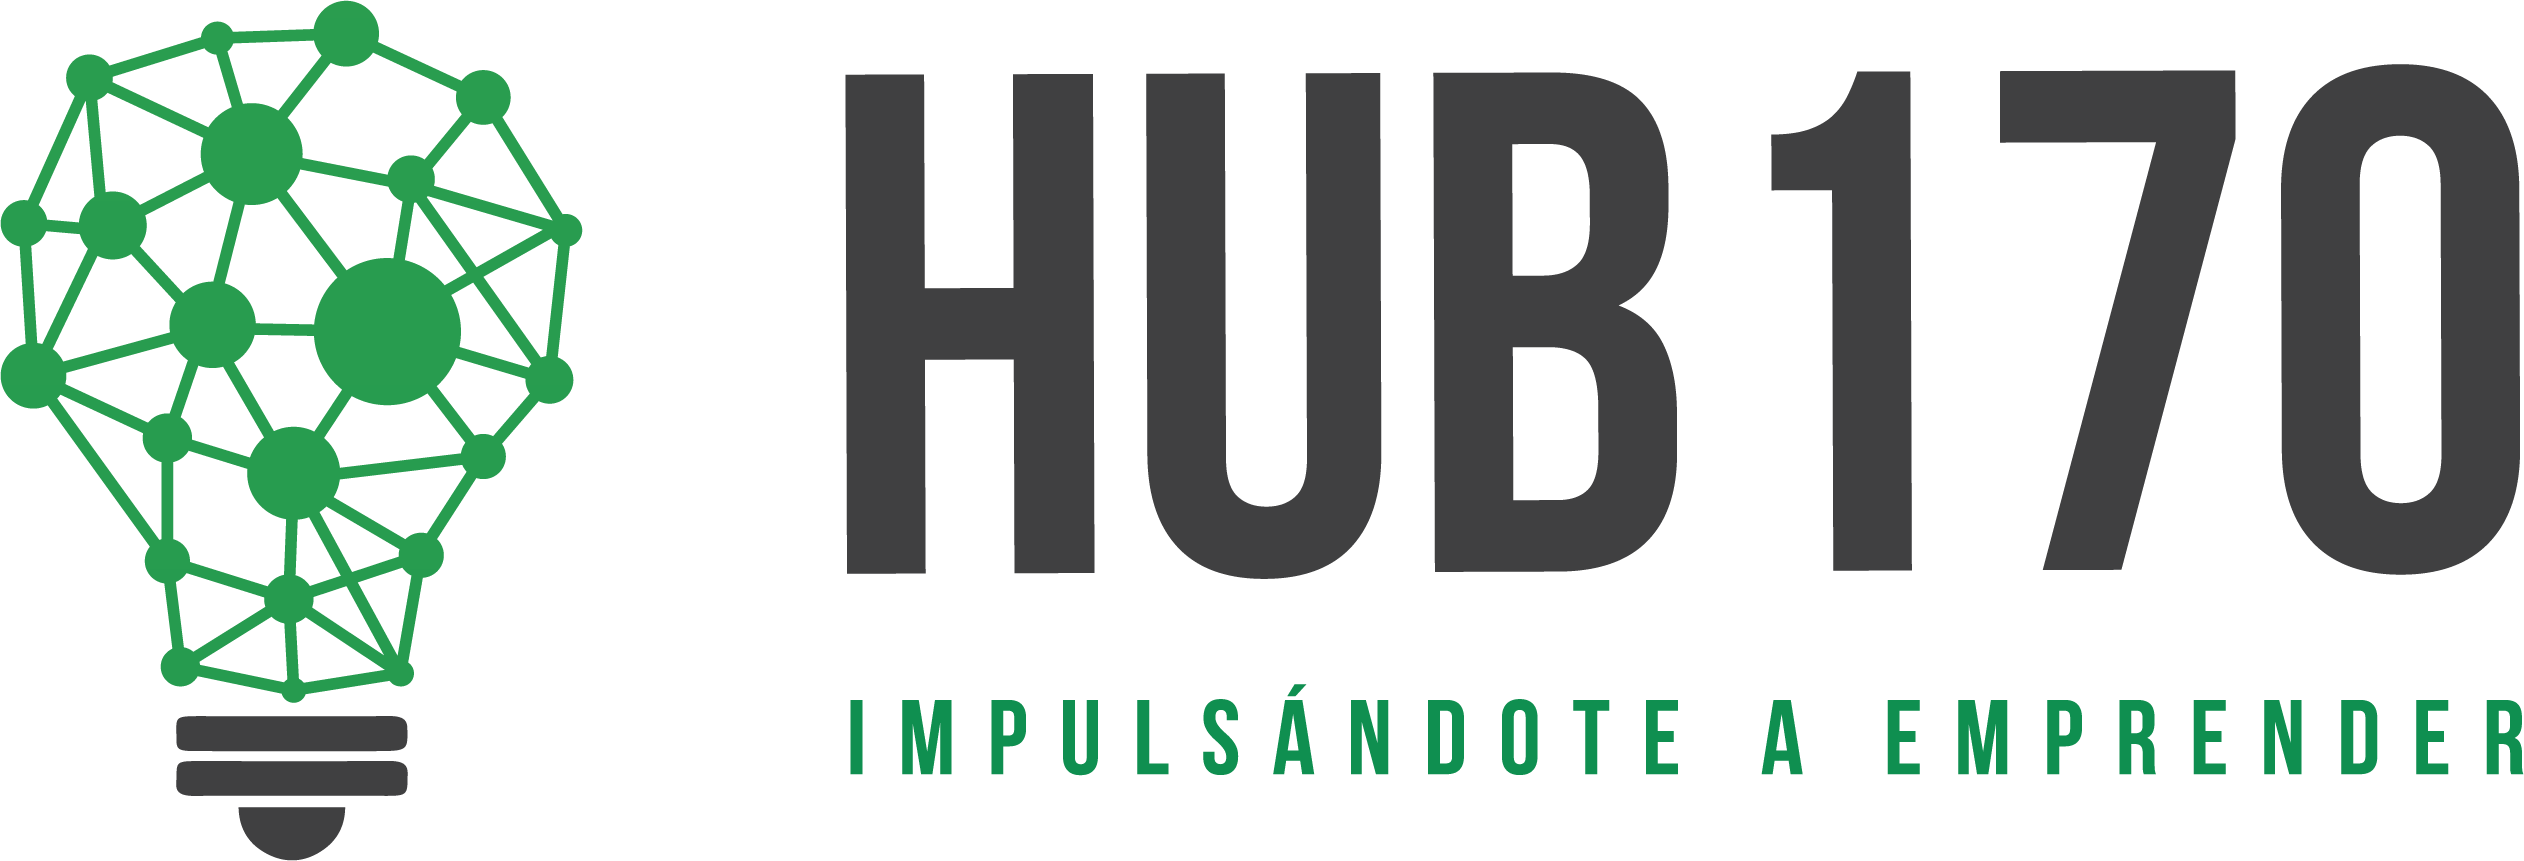 Hub170